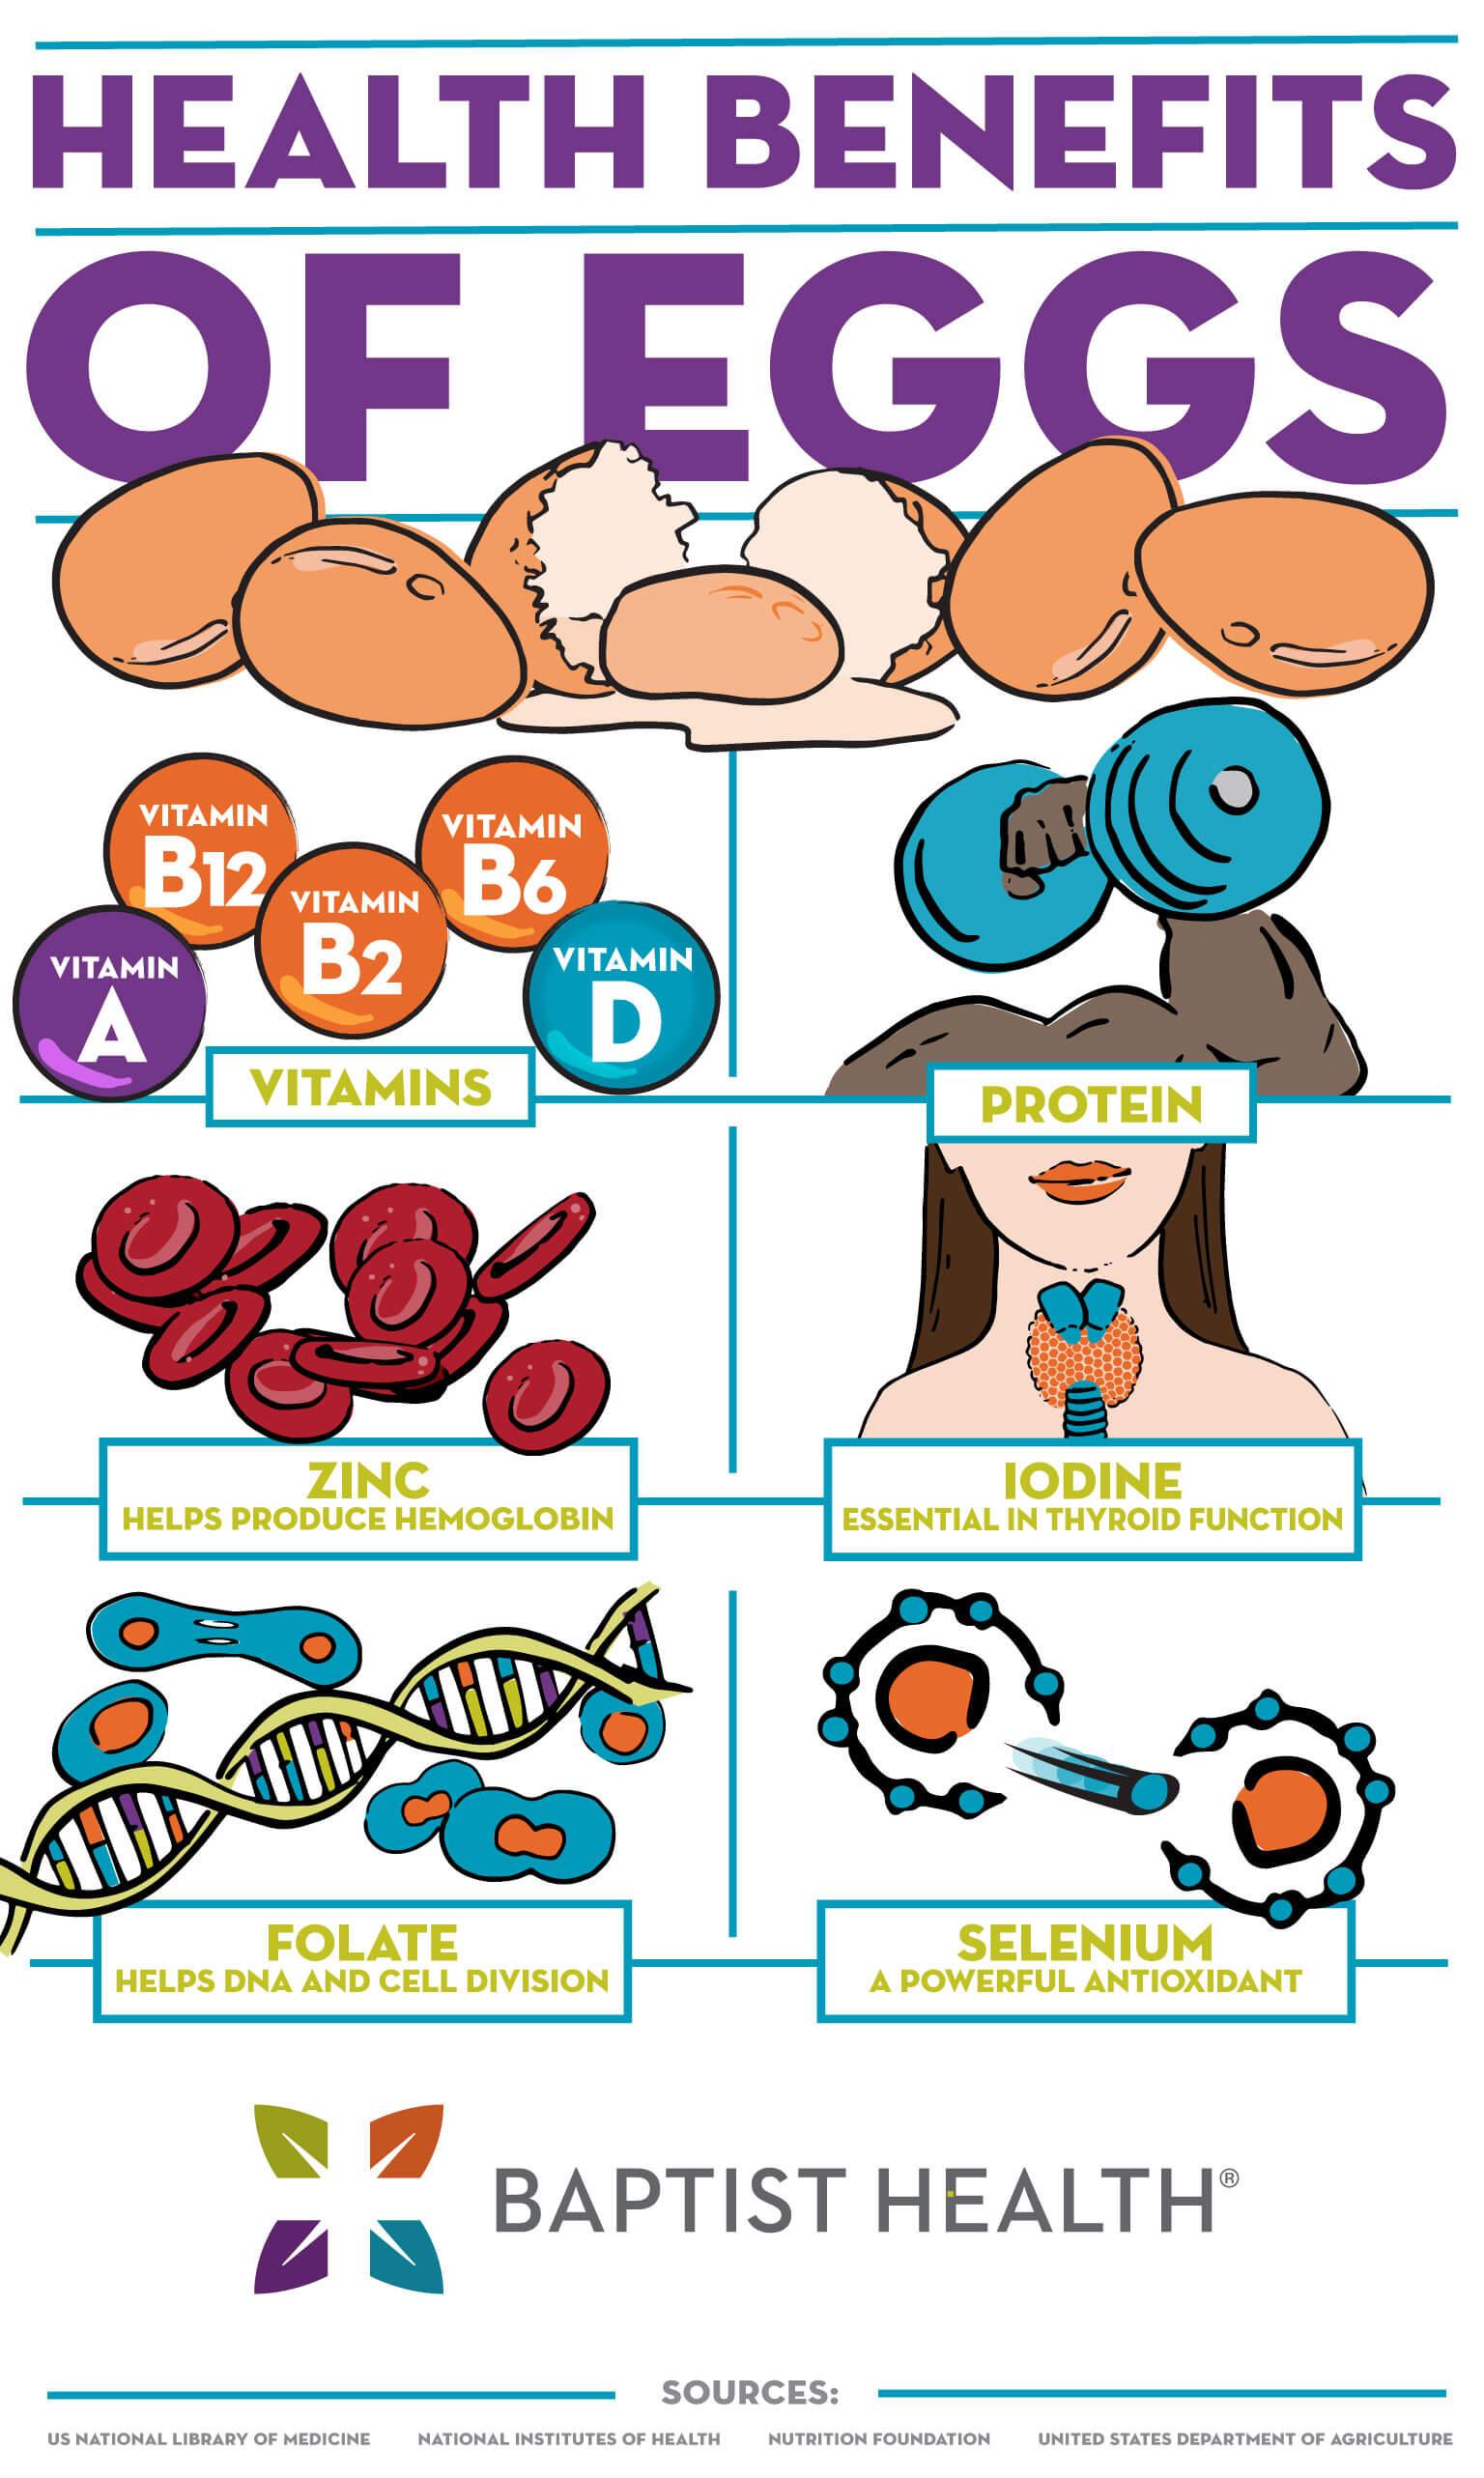 health benefits of eggs infographic